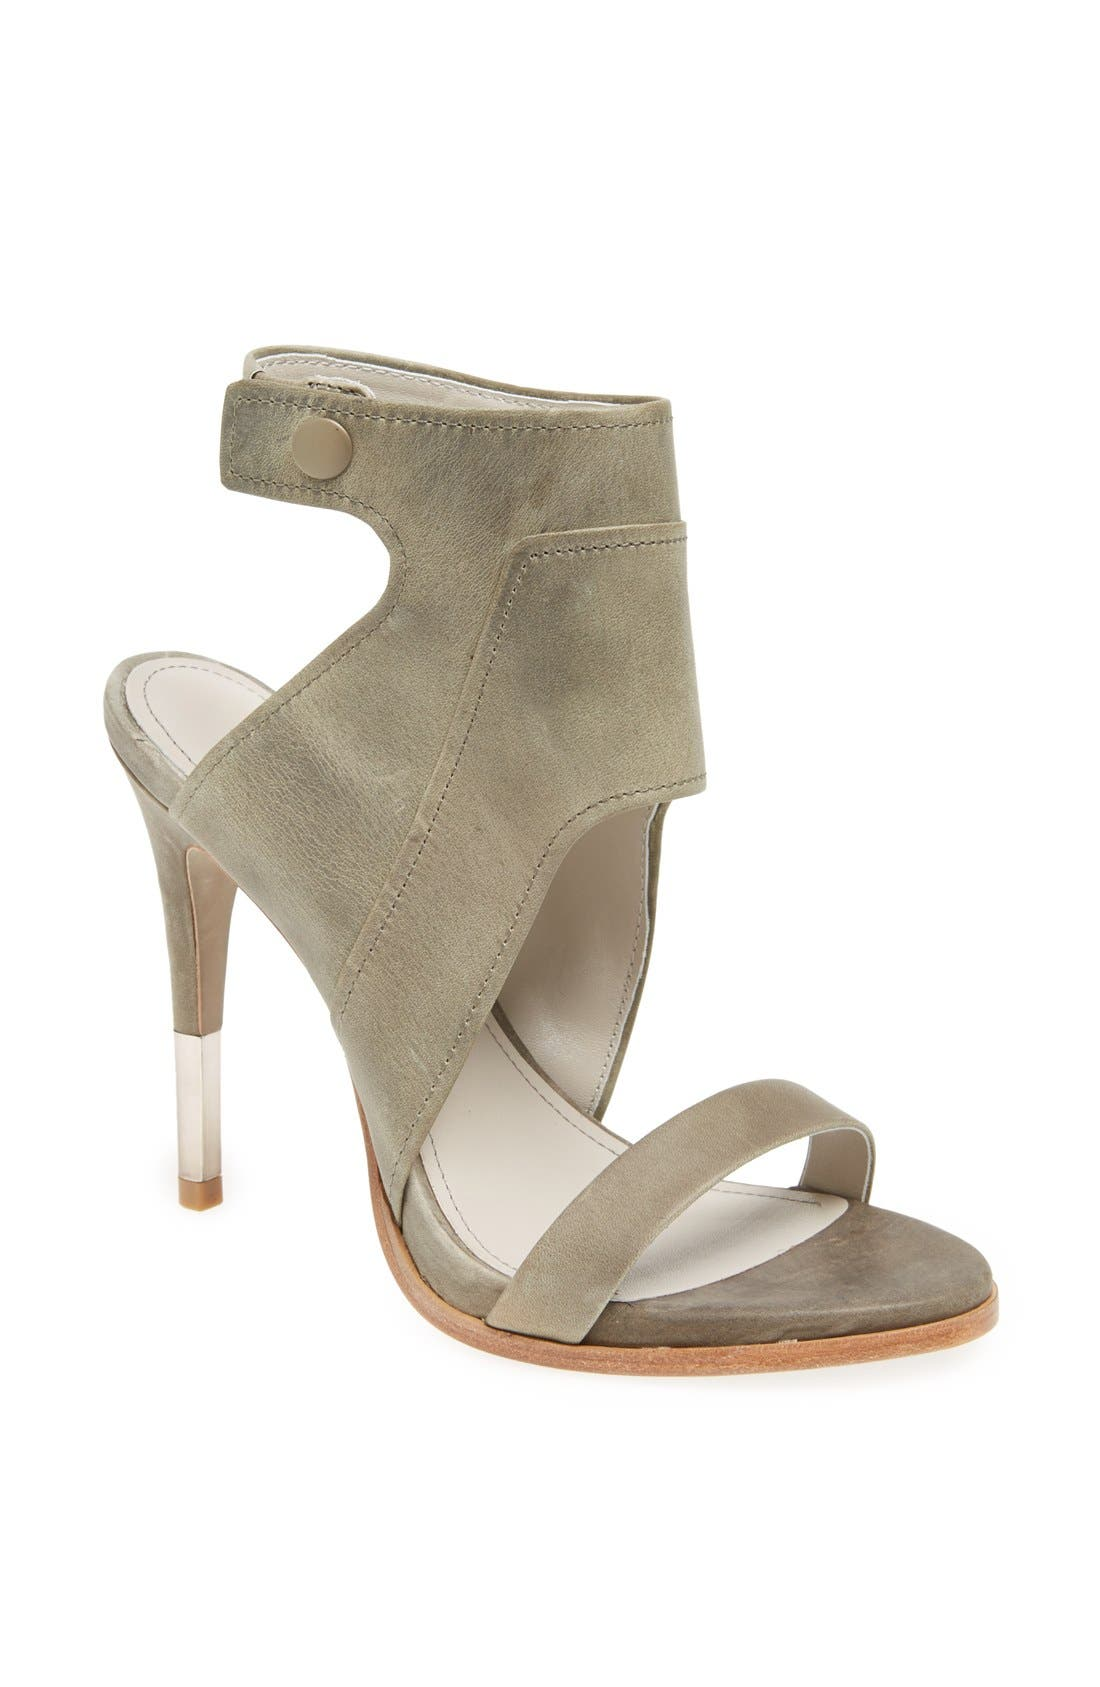 Main Image - Pour la Victoire 'Venga' Sandal